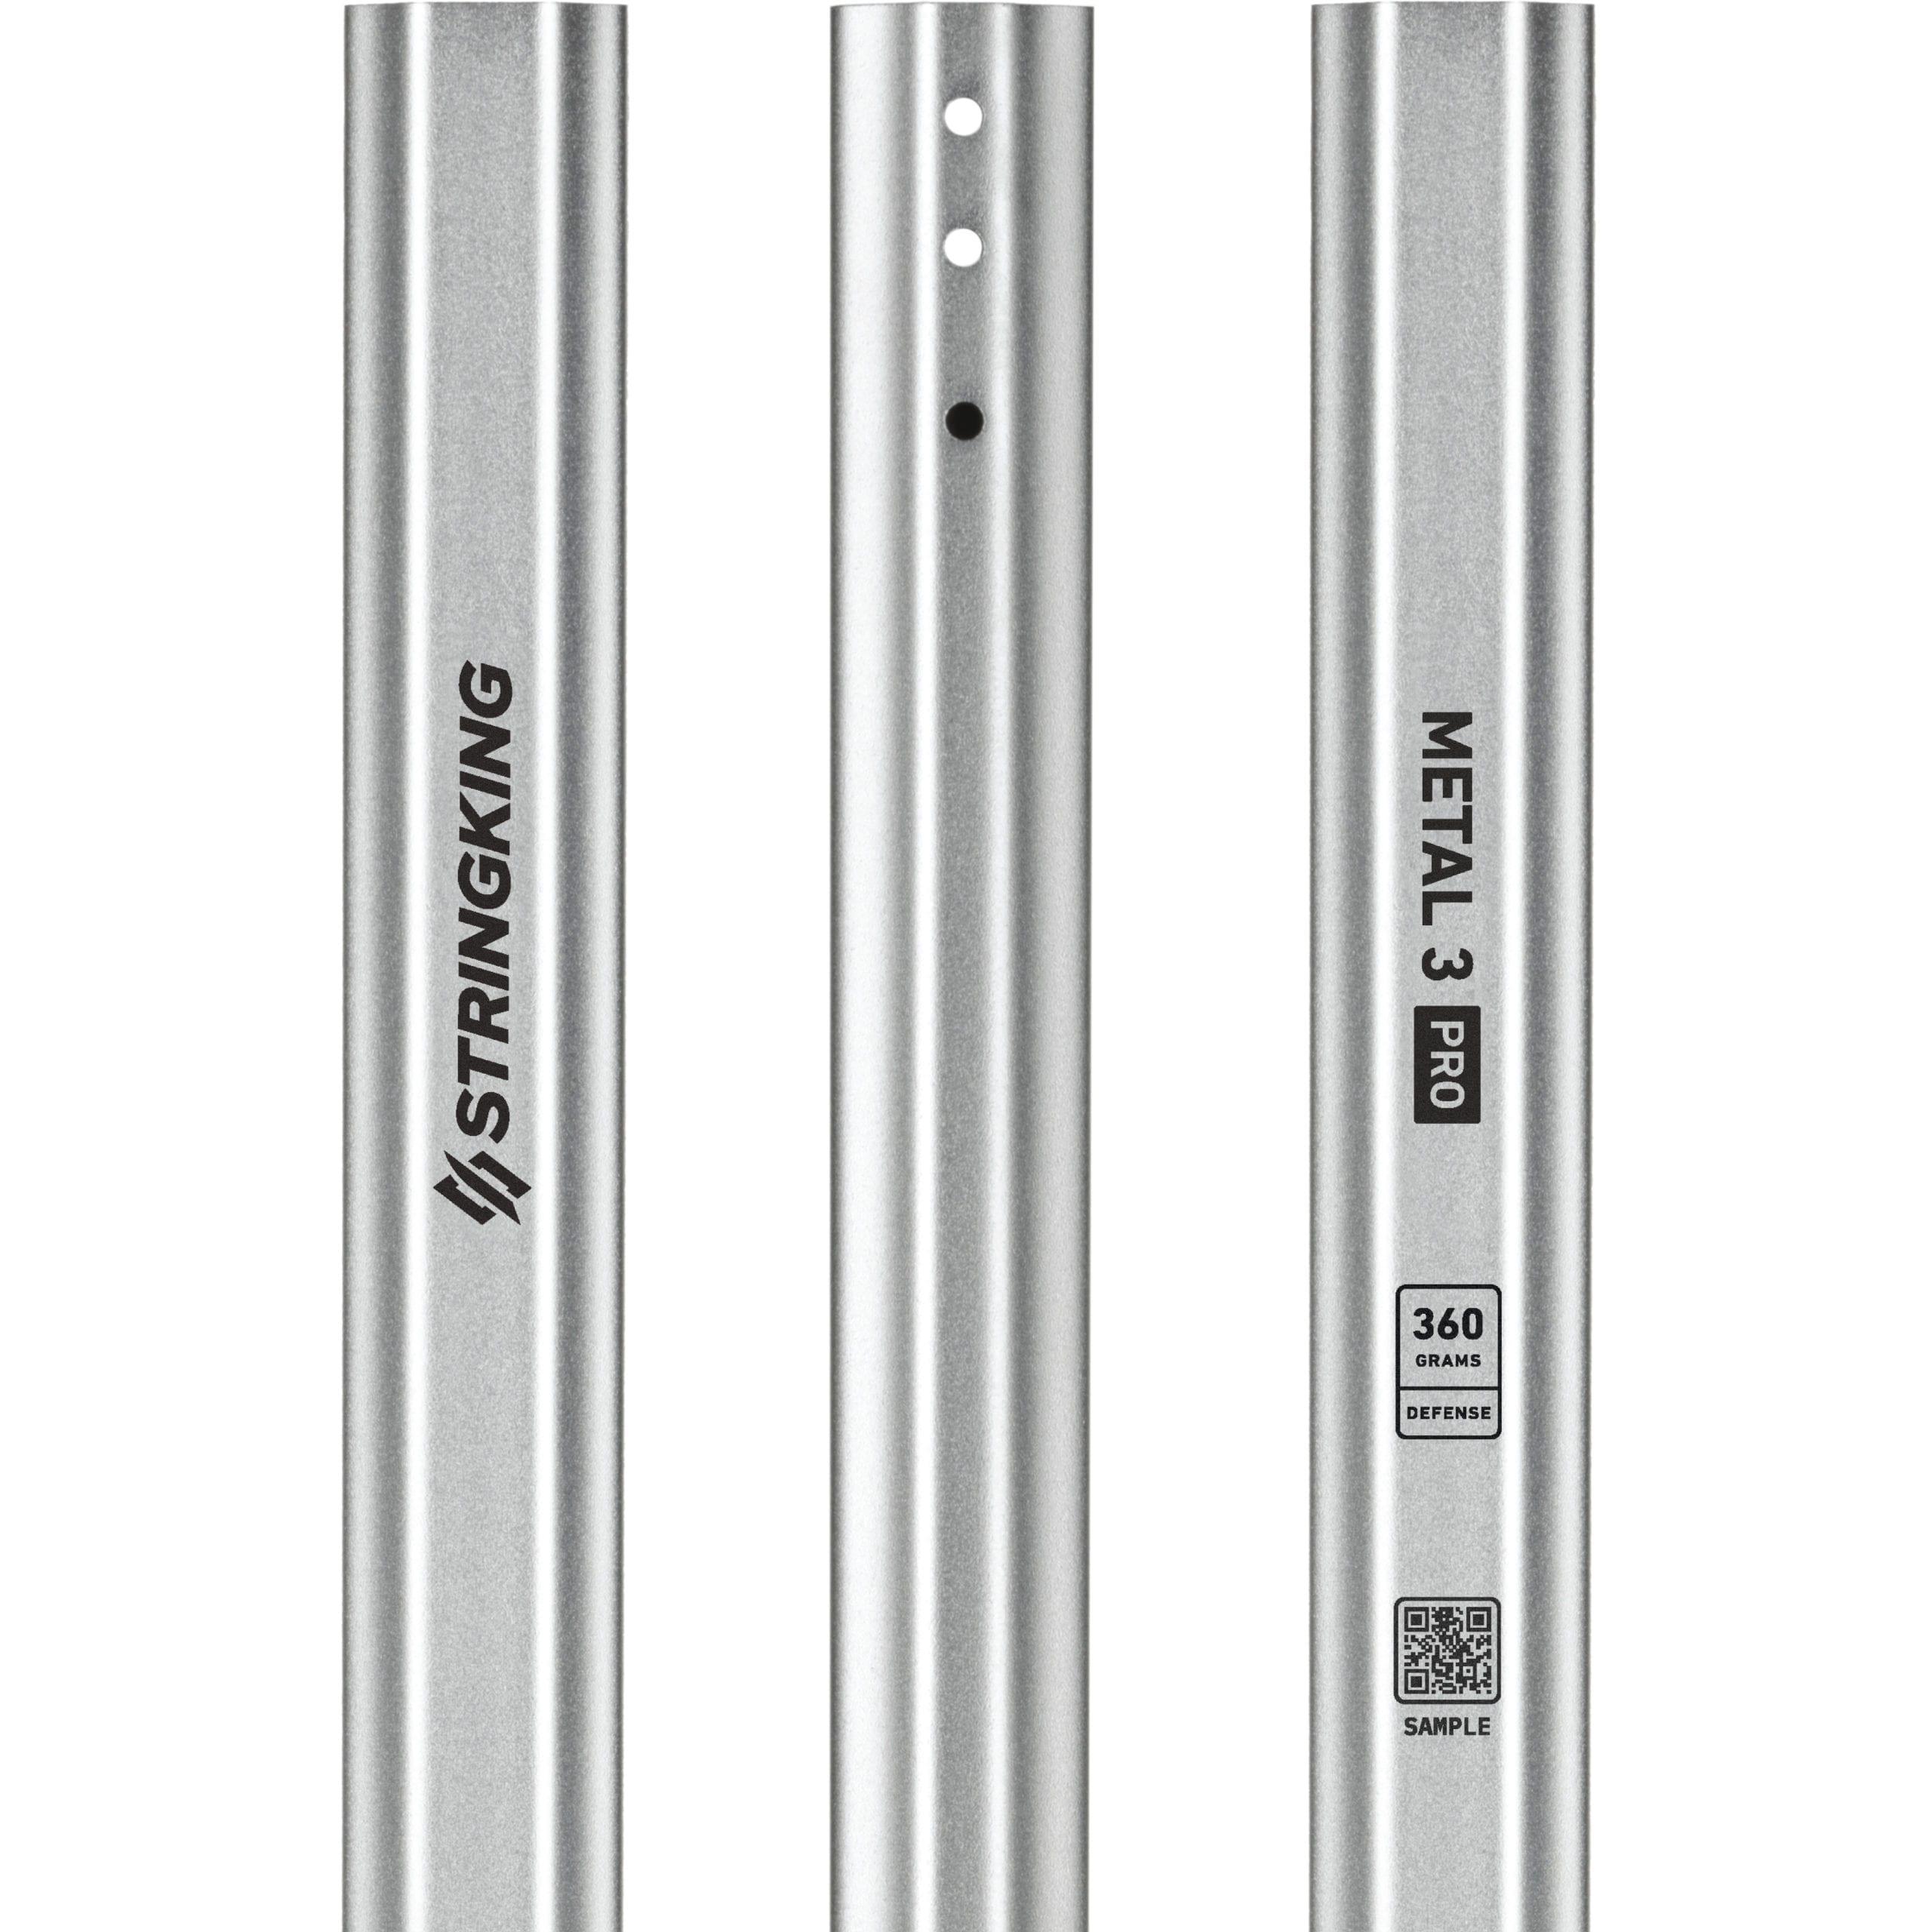 StringKing-Metal-3-Pro-Defense-360-Lacrosse-Shaft-Silver-Triple-View-scaled-1.jpg